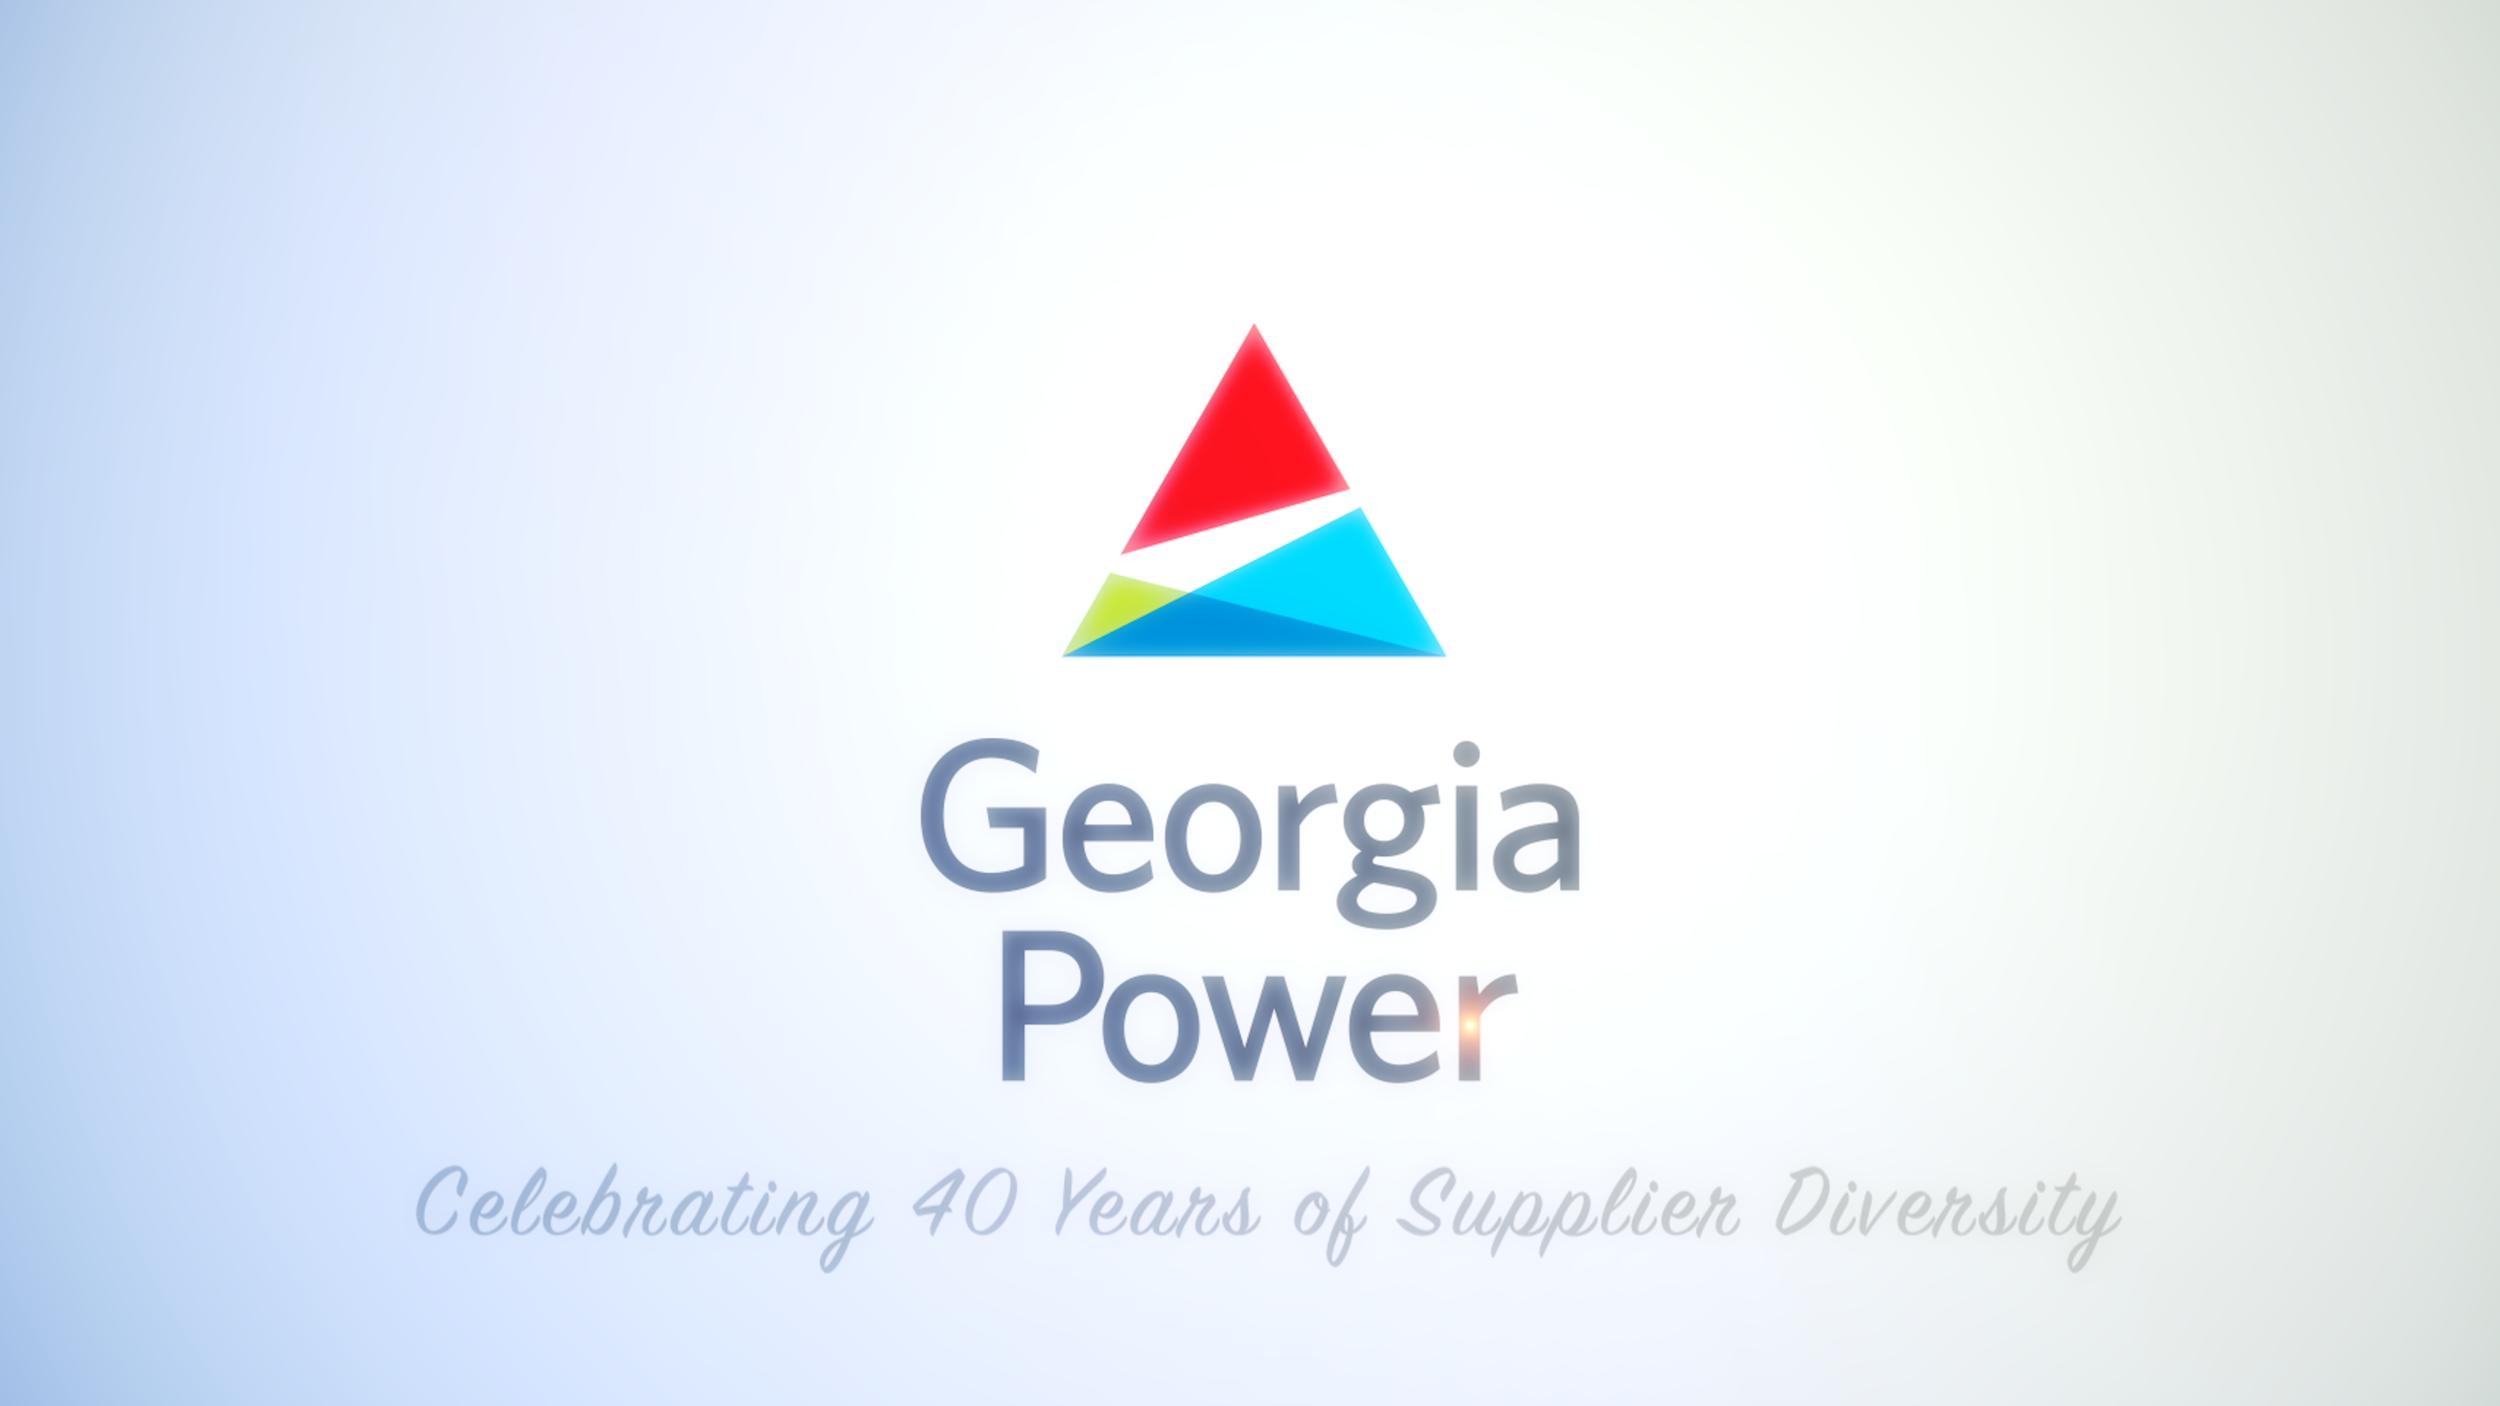 georgia power commercial